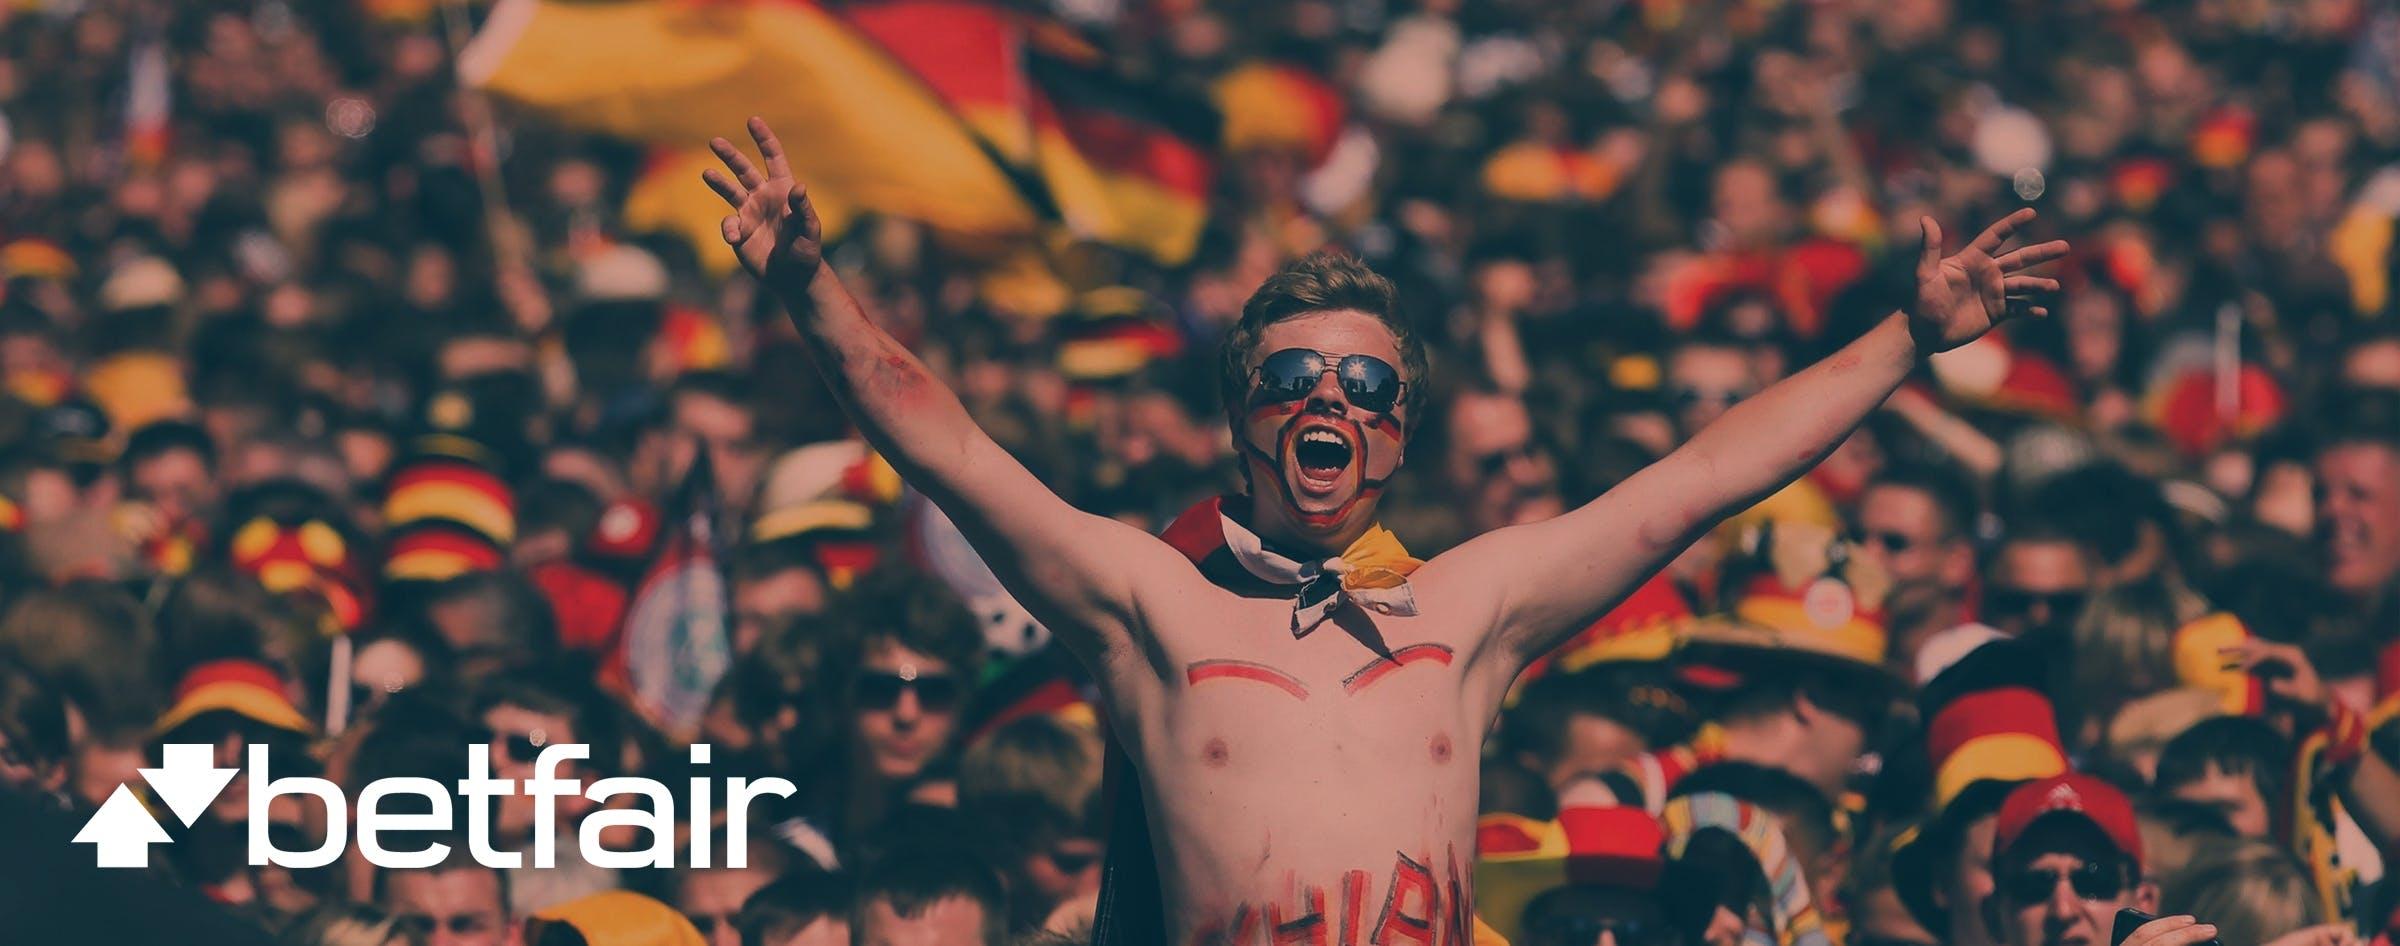 German Fans Betfair Cropped